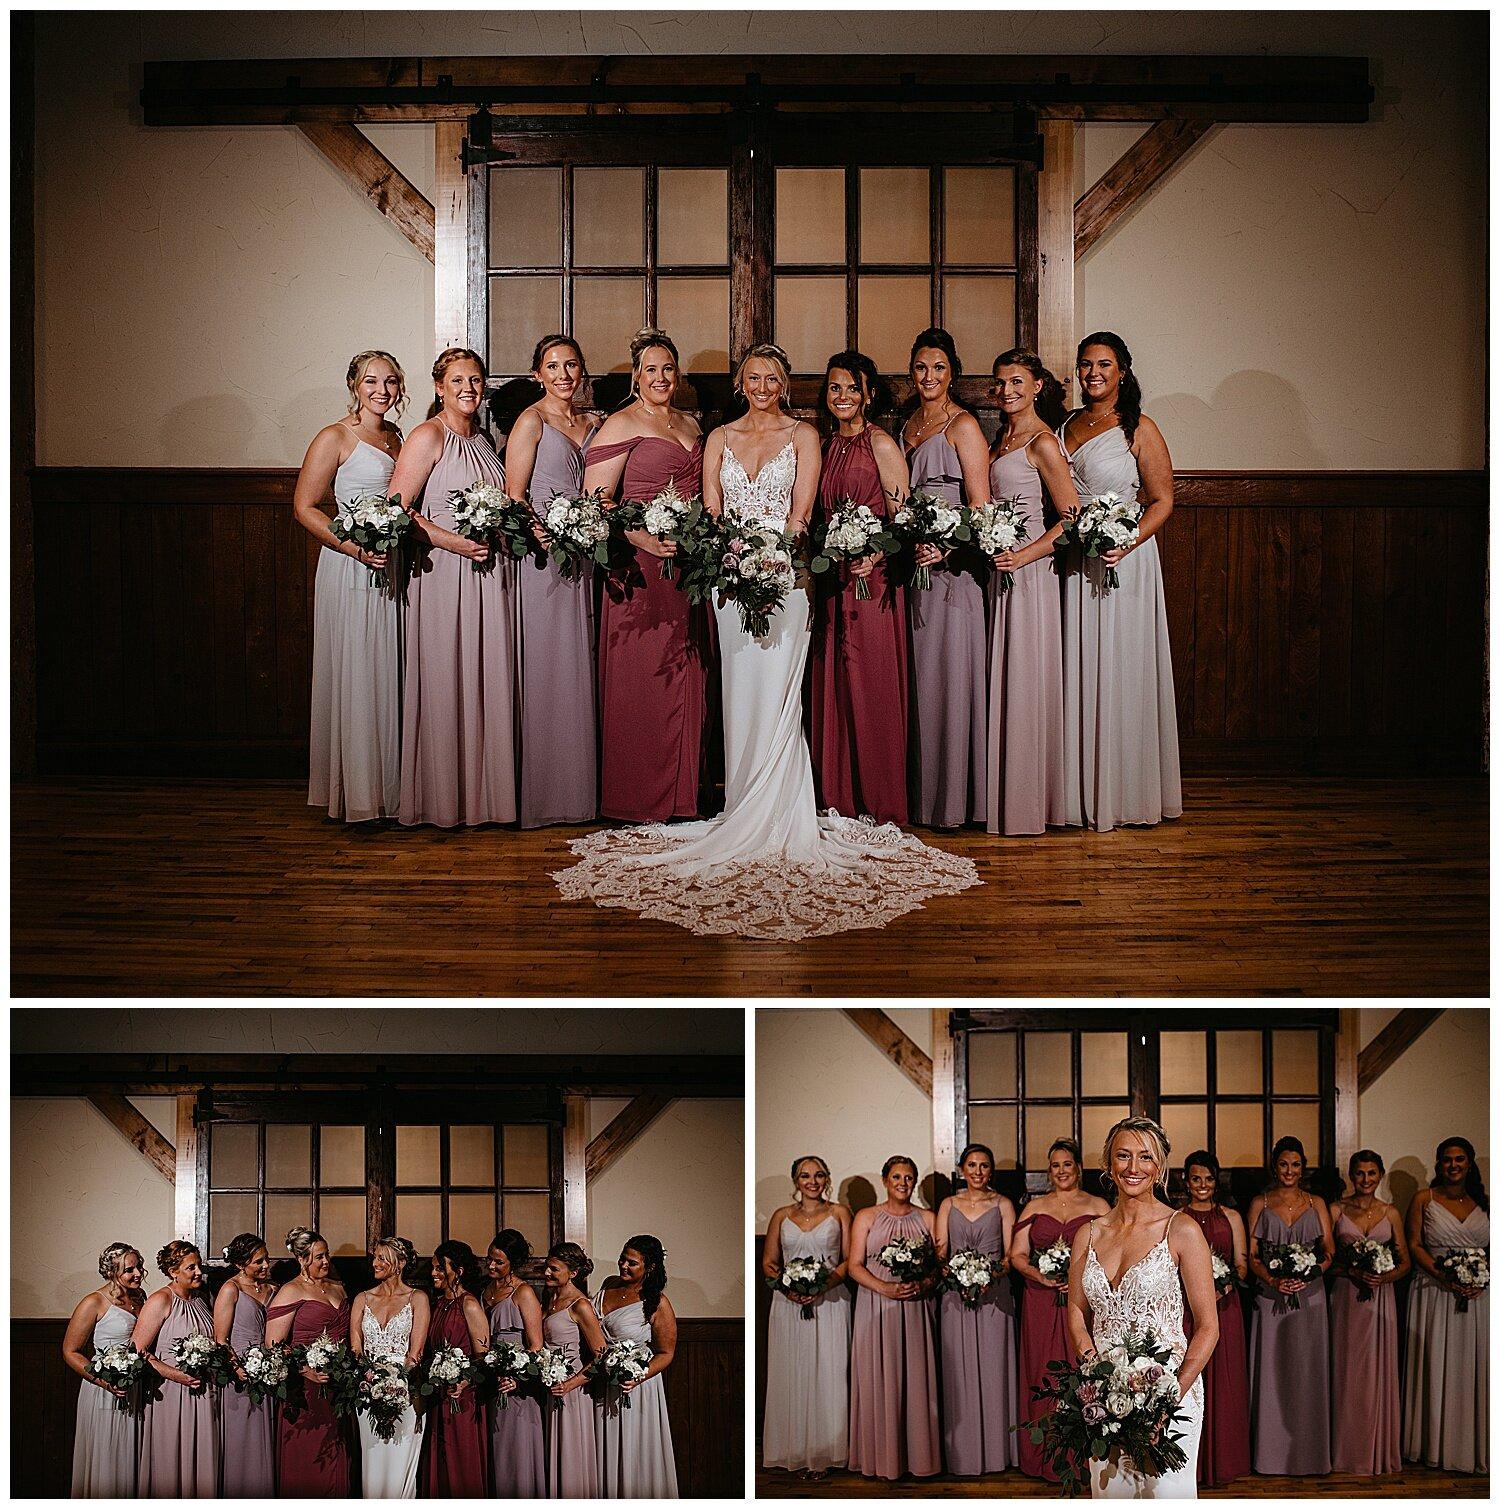 NEPA-Lewisburg-Wedding-Photographer-at-the-Rusty-Rail_0022.jpg